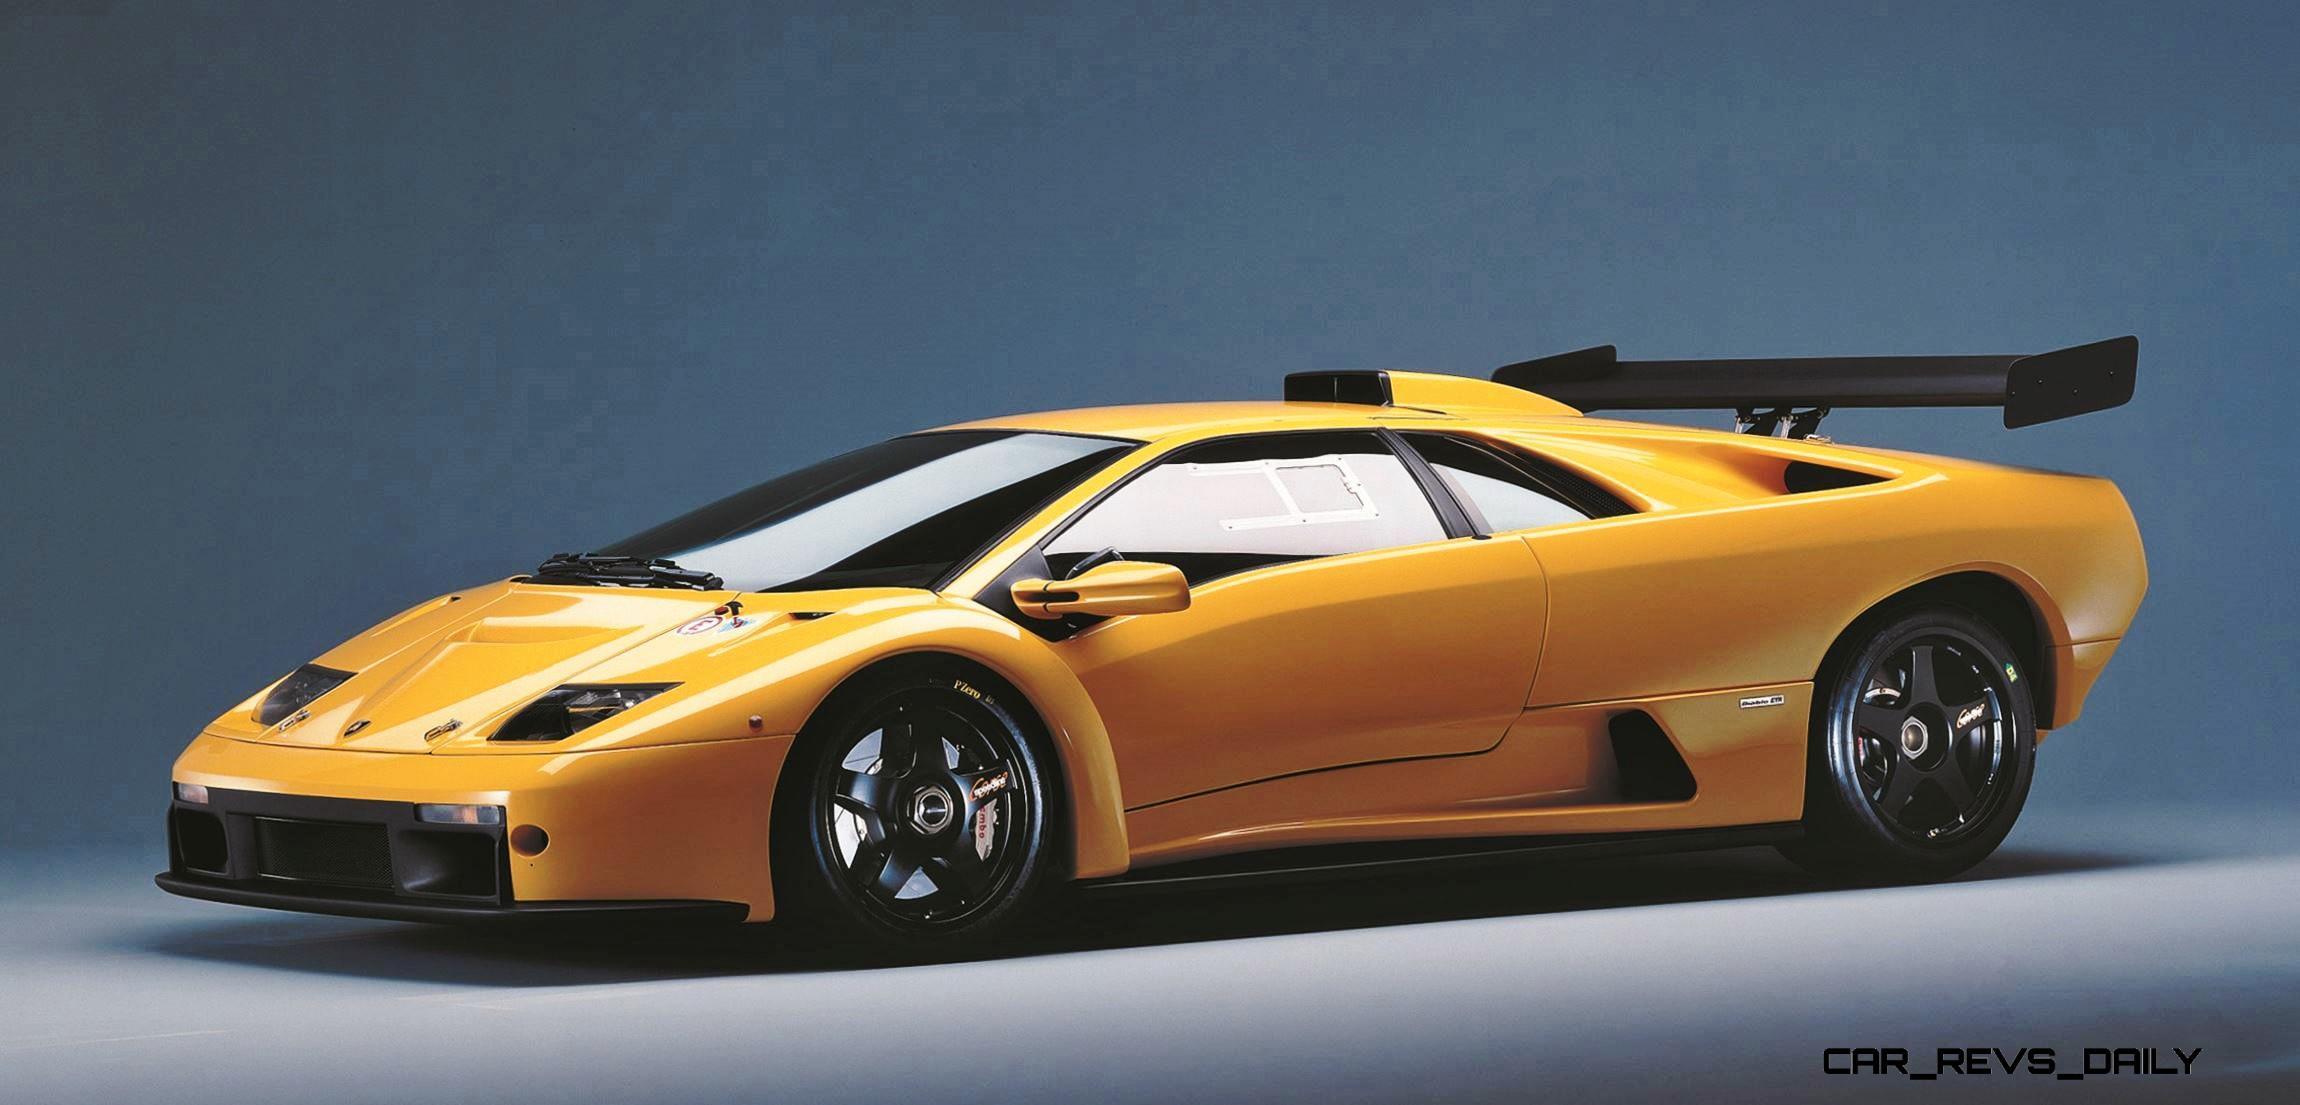 Hypercar Heroes Lamborghini Diablo Evolution Vt To Se Jota To Sv Svr And Roadster Then